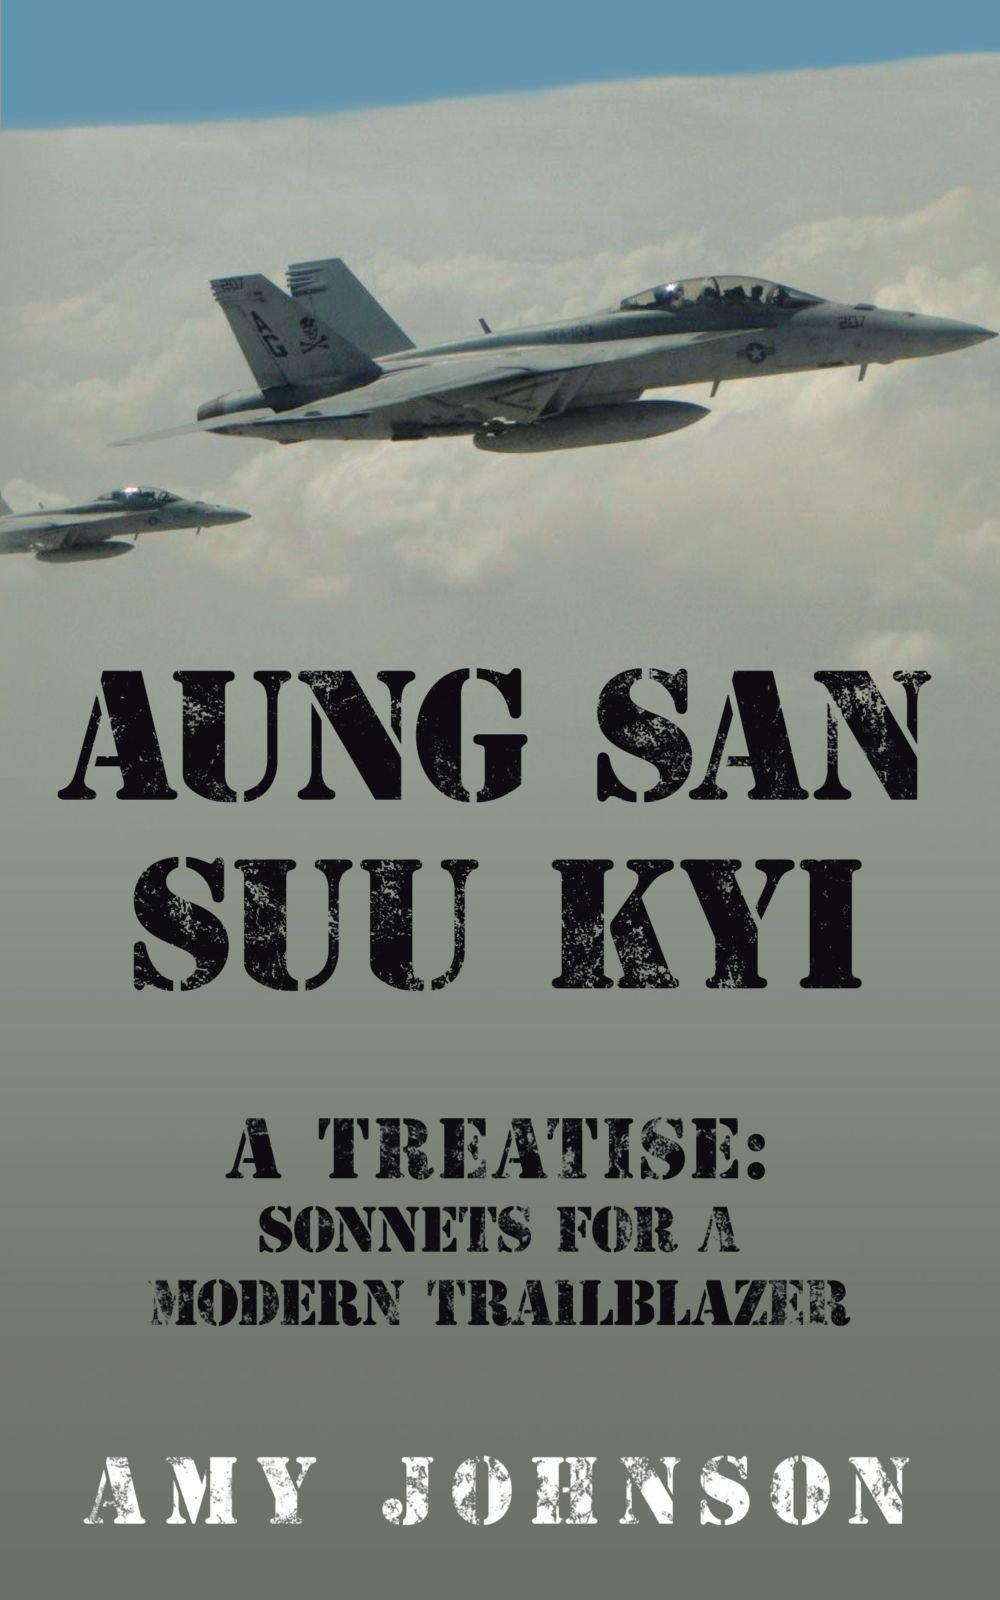 Download Aung San Suu Kyi A Treatise: Sonnets For a Modern Trailblazer PDF